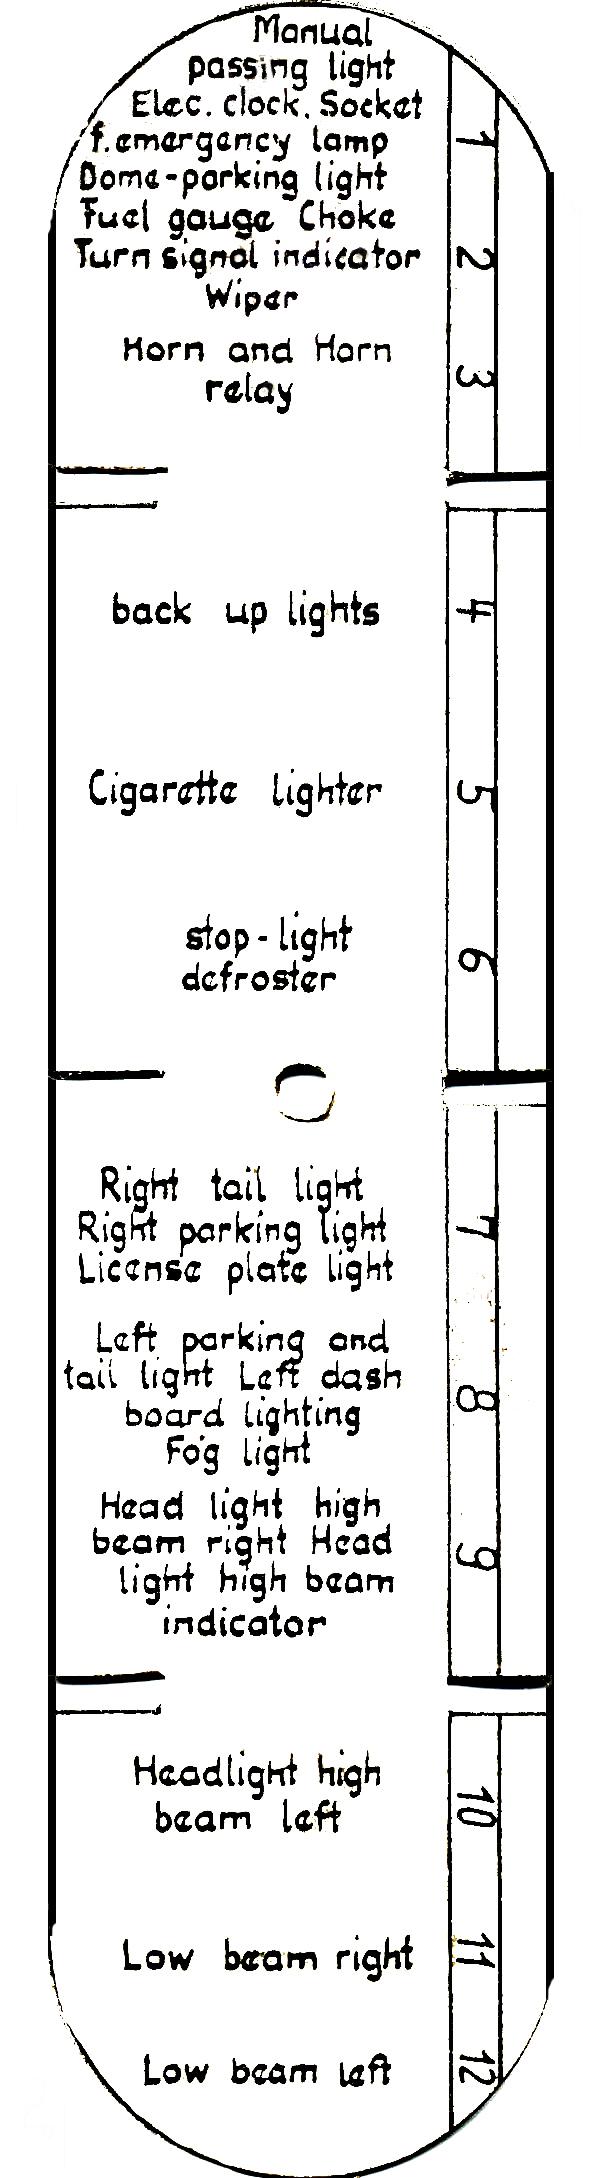 fuse box label  1961 mercedes benz engine diagram